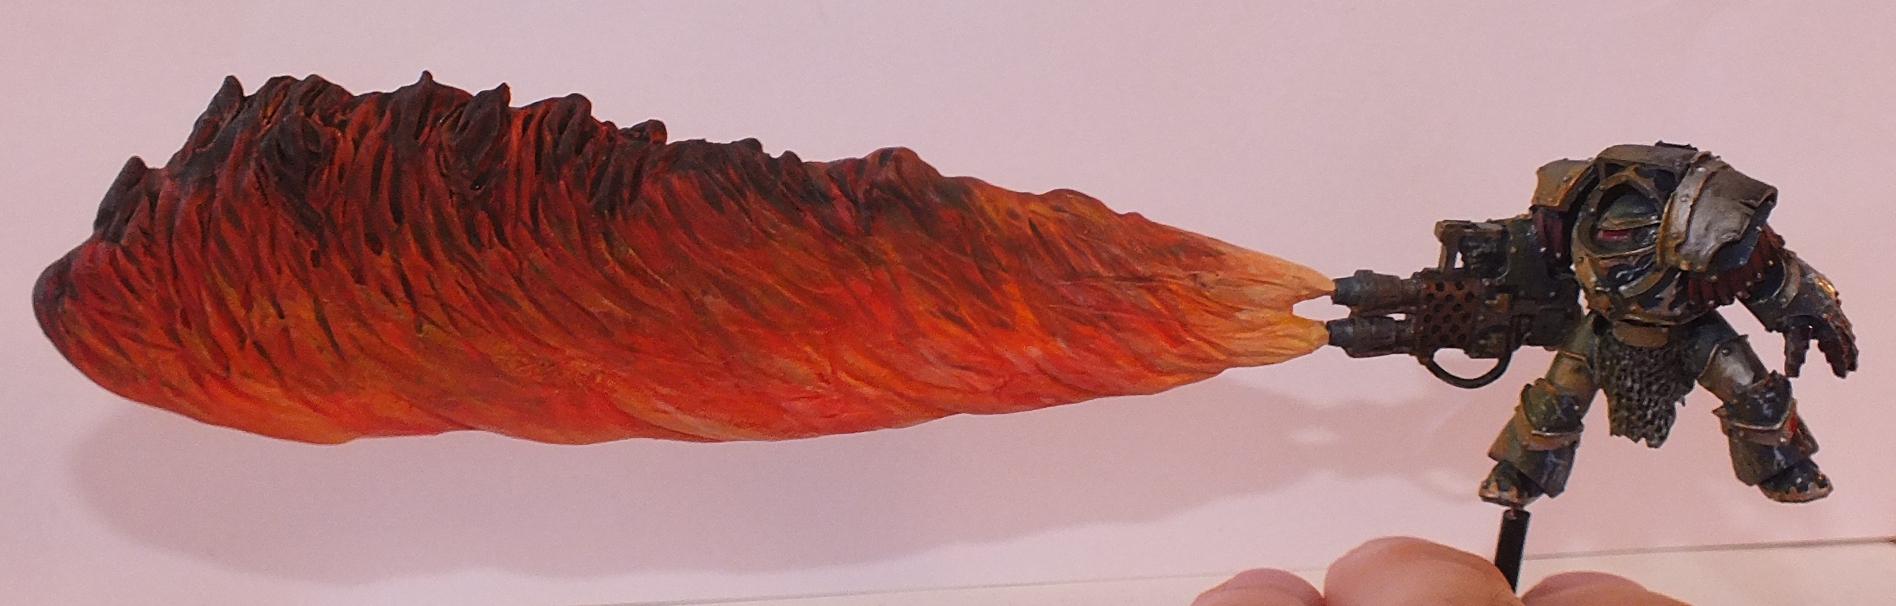 1ère figurines pour diorama Istvaan V - Page 3 442997DSCF5036